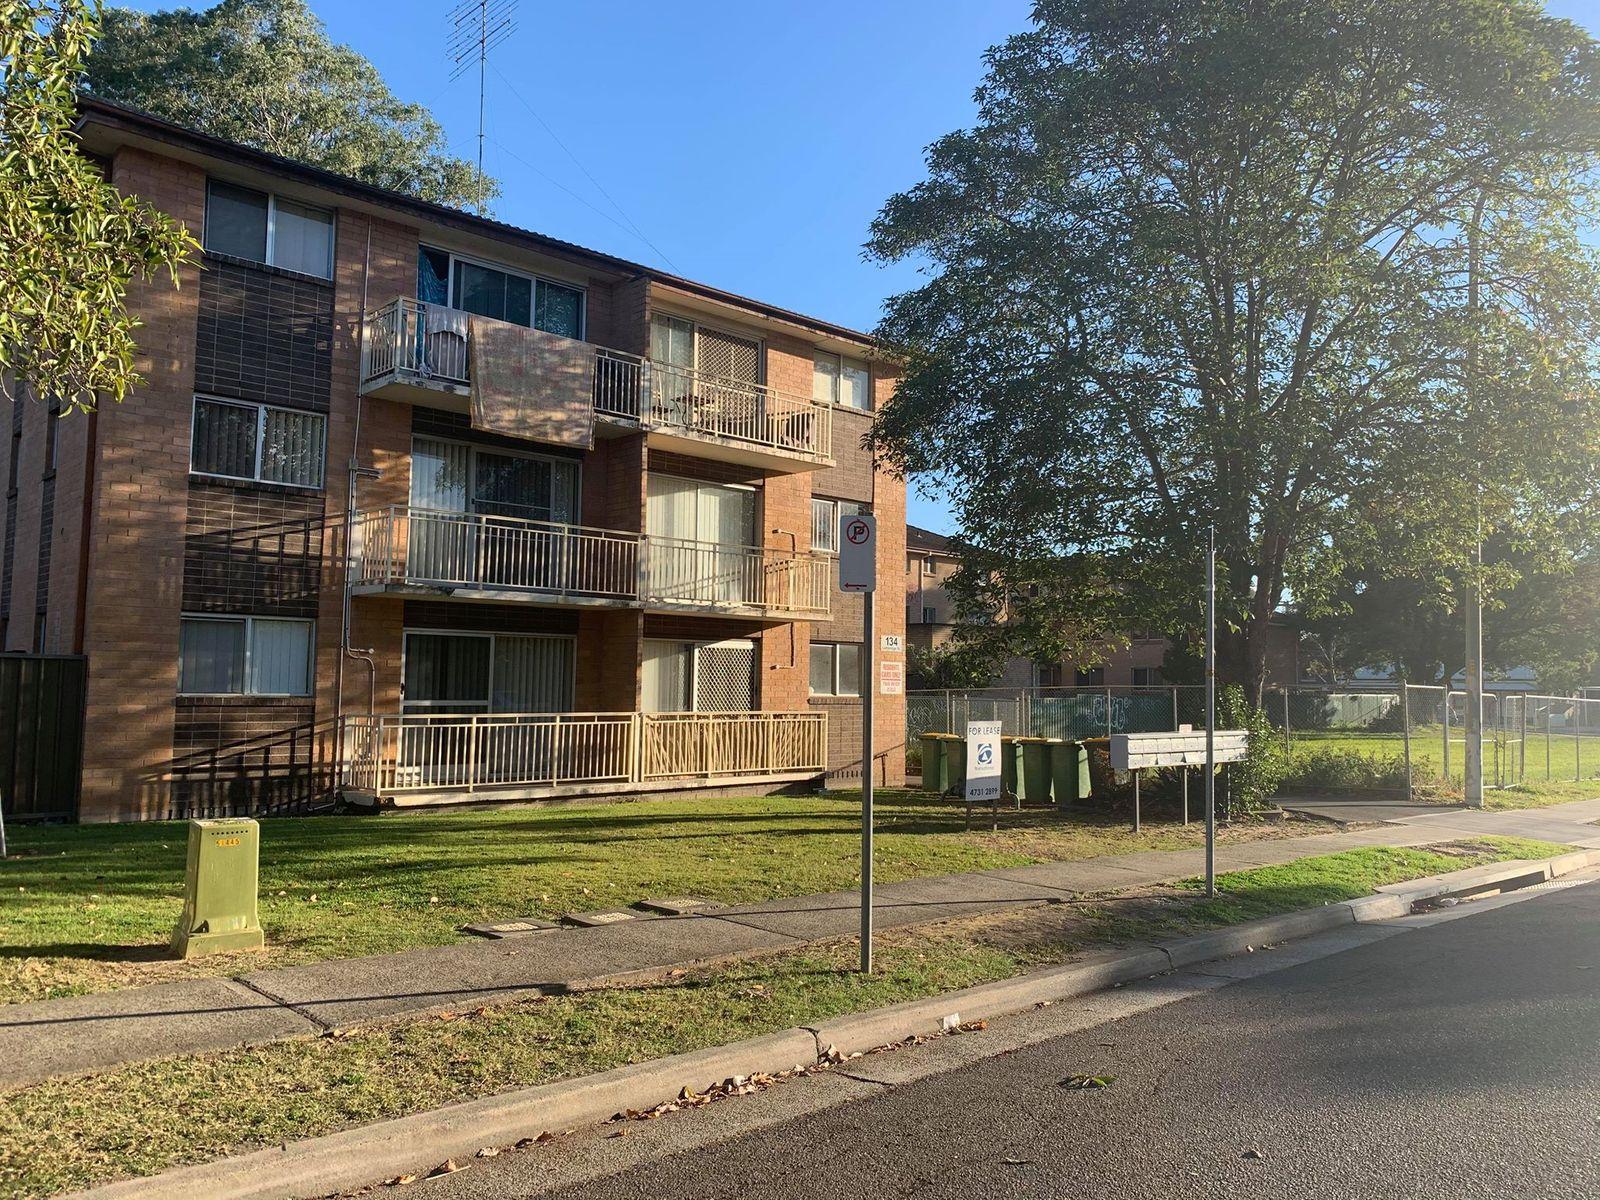 8/134 Lethbridge Street, Penrith, NSW 2750